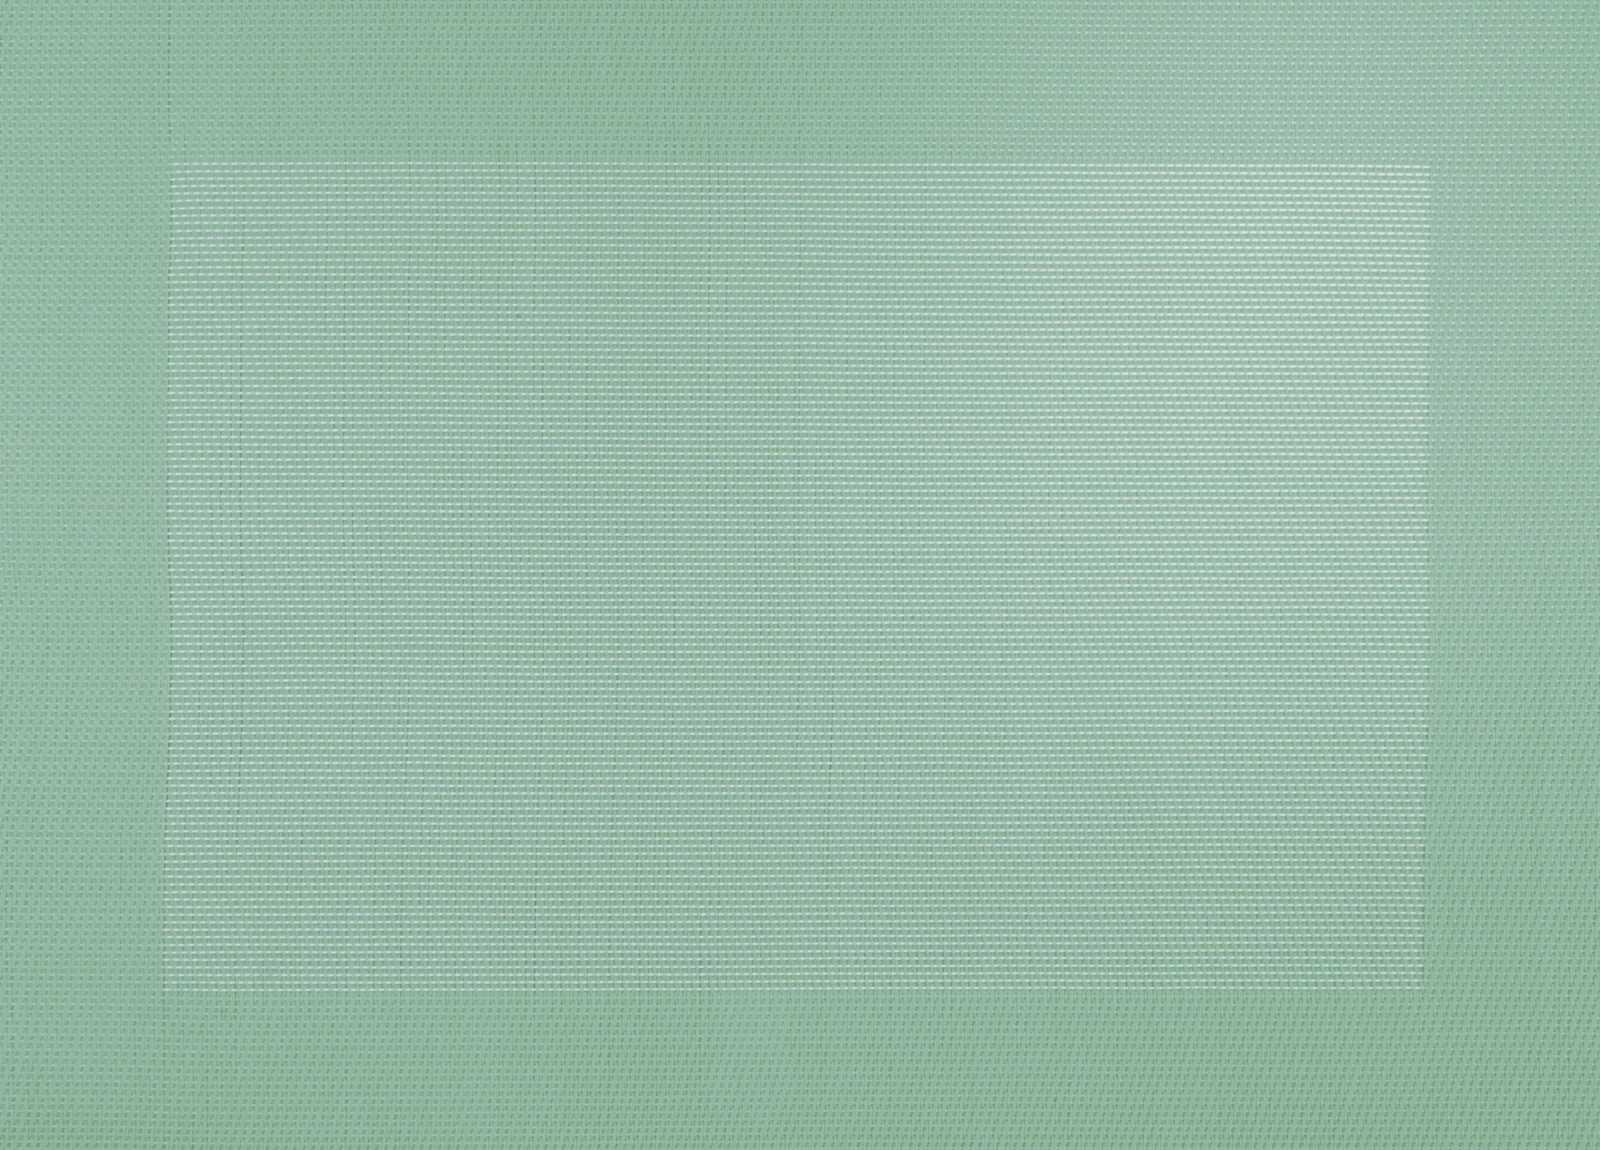 Онлайн каталог PROMENU: Подставка под тарелку ASA Selection PVC PLACEMATS, размеры  46х33 см, зеленый  78106076